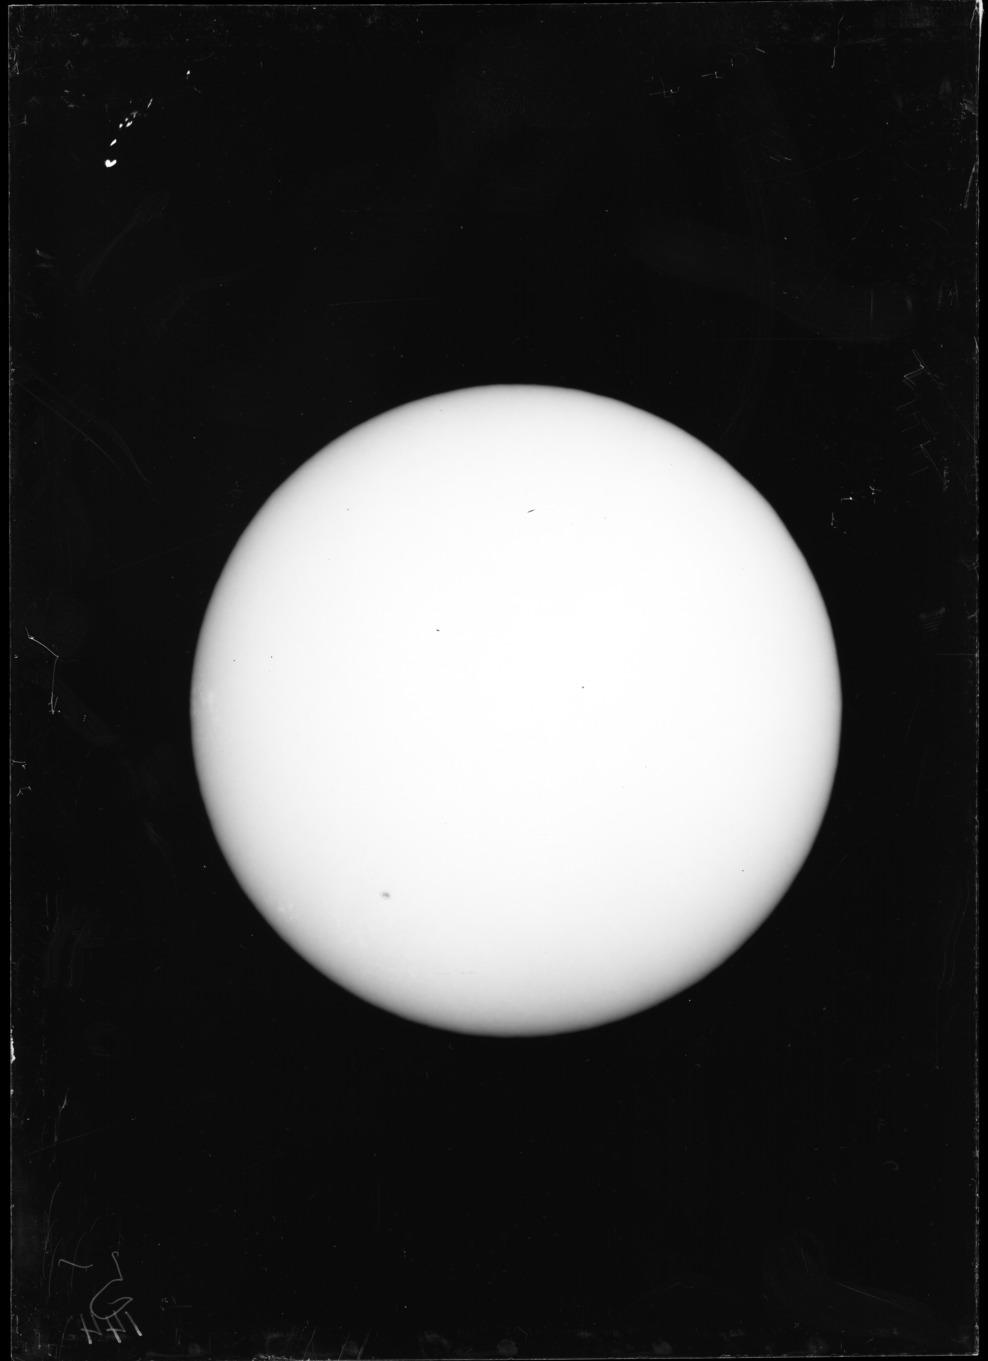 AGlV144